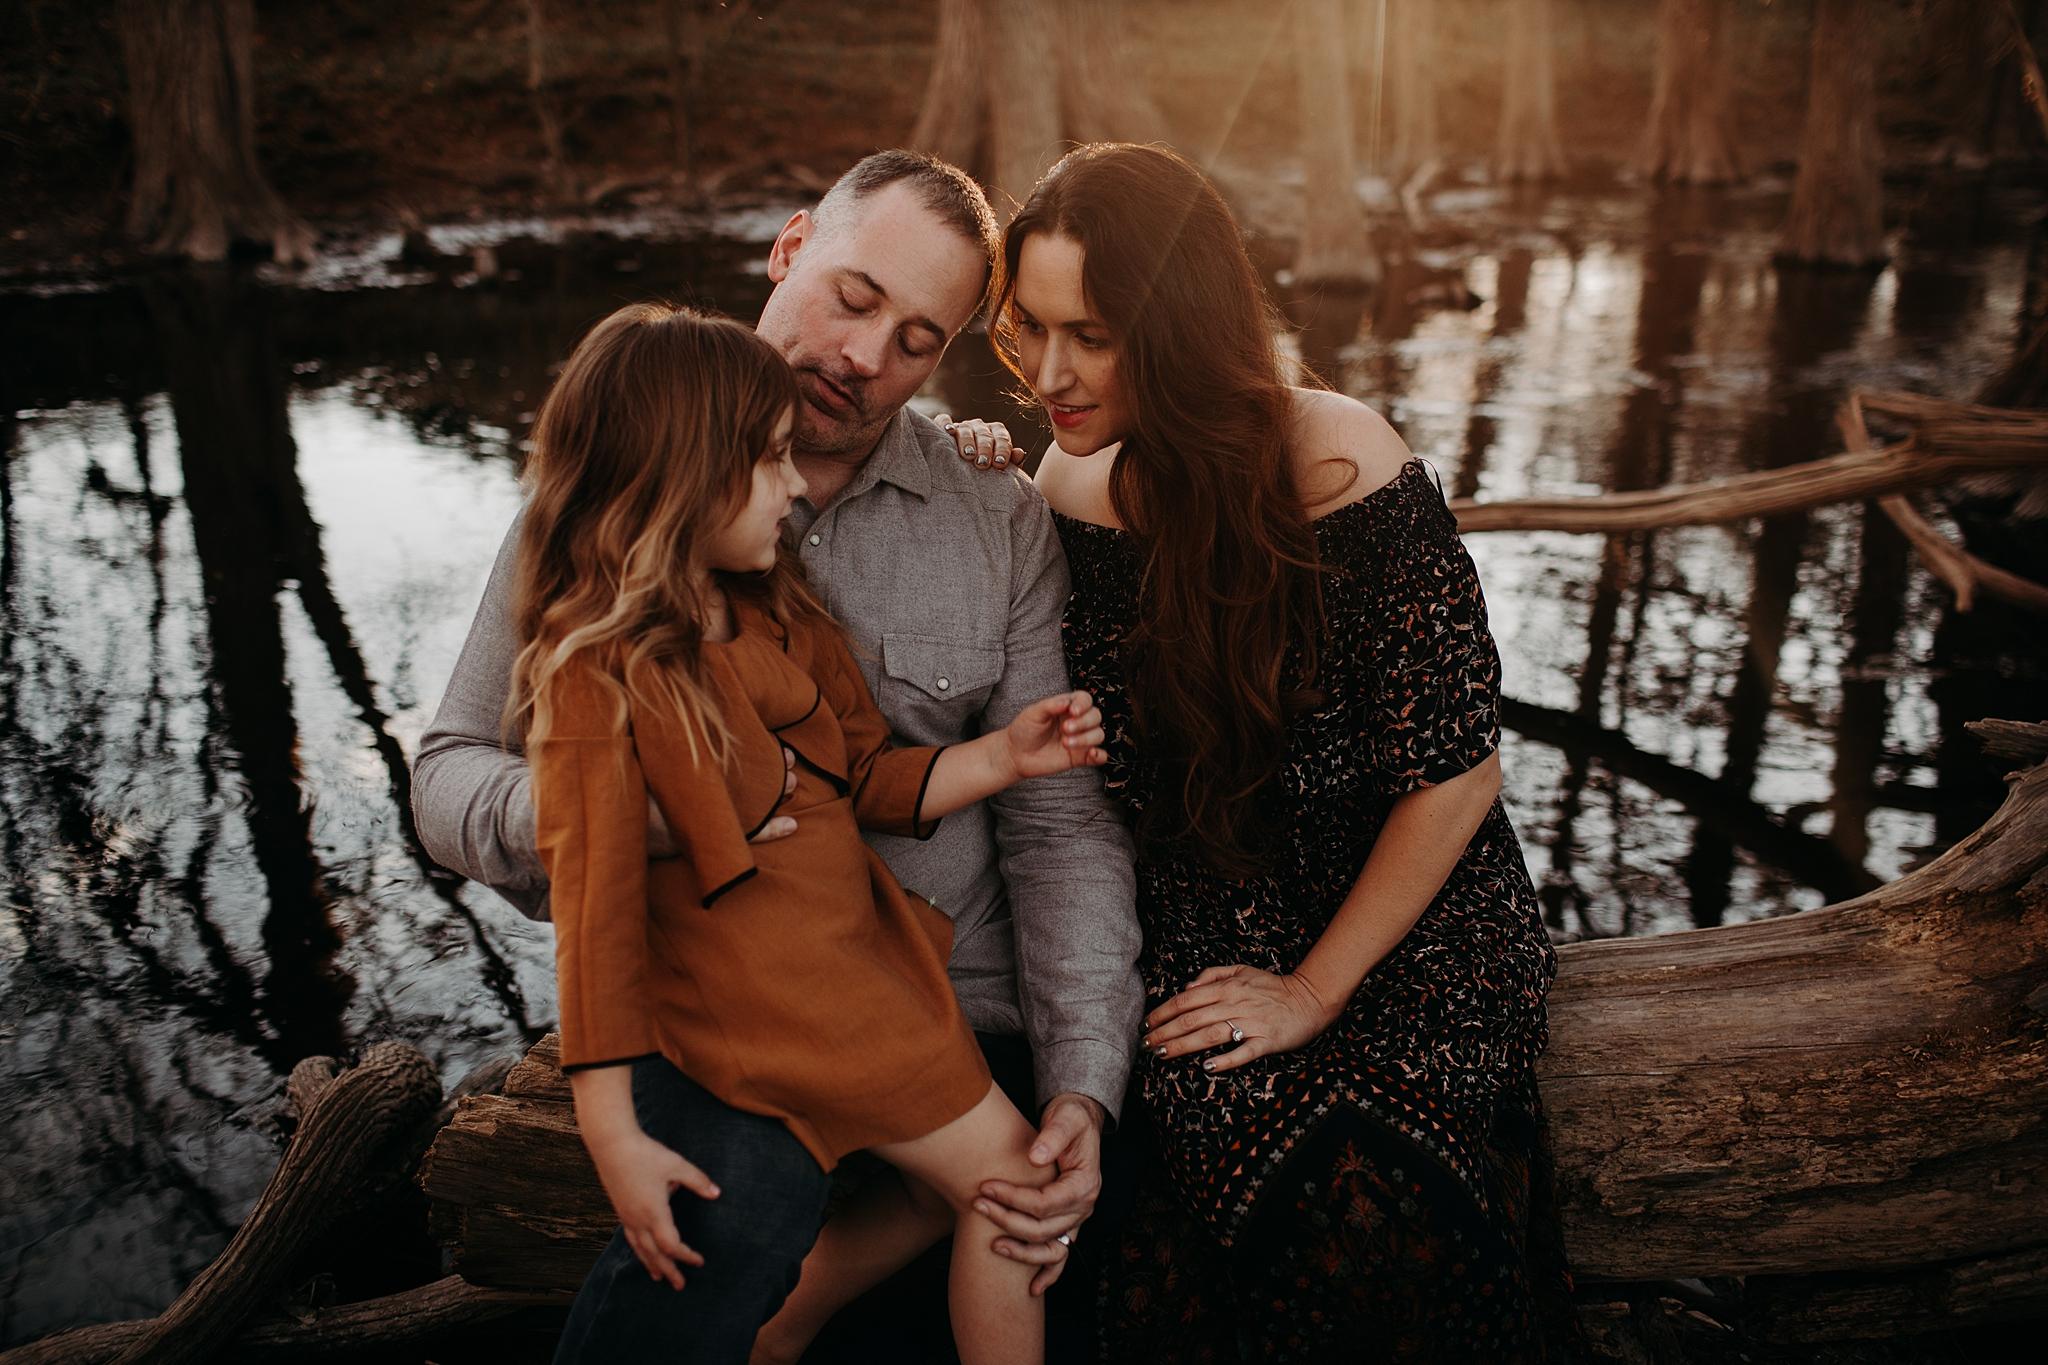 Ware-San-Antonio-Family-Photography-38_WEB.jpg